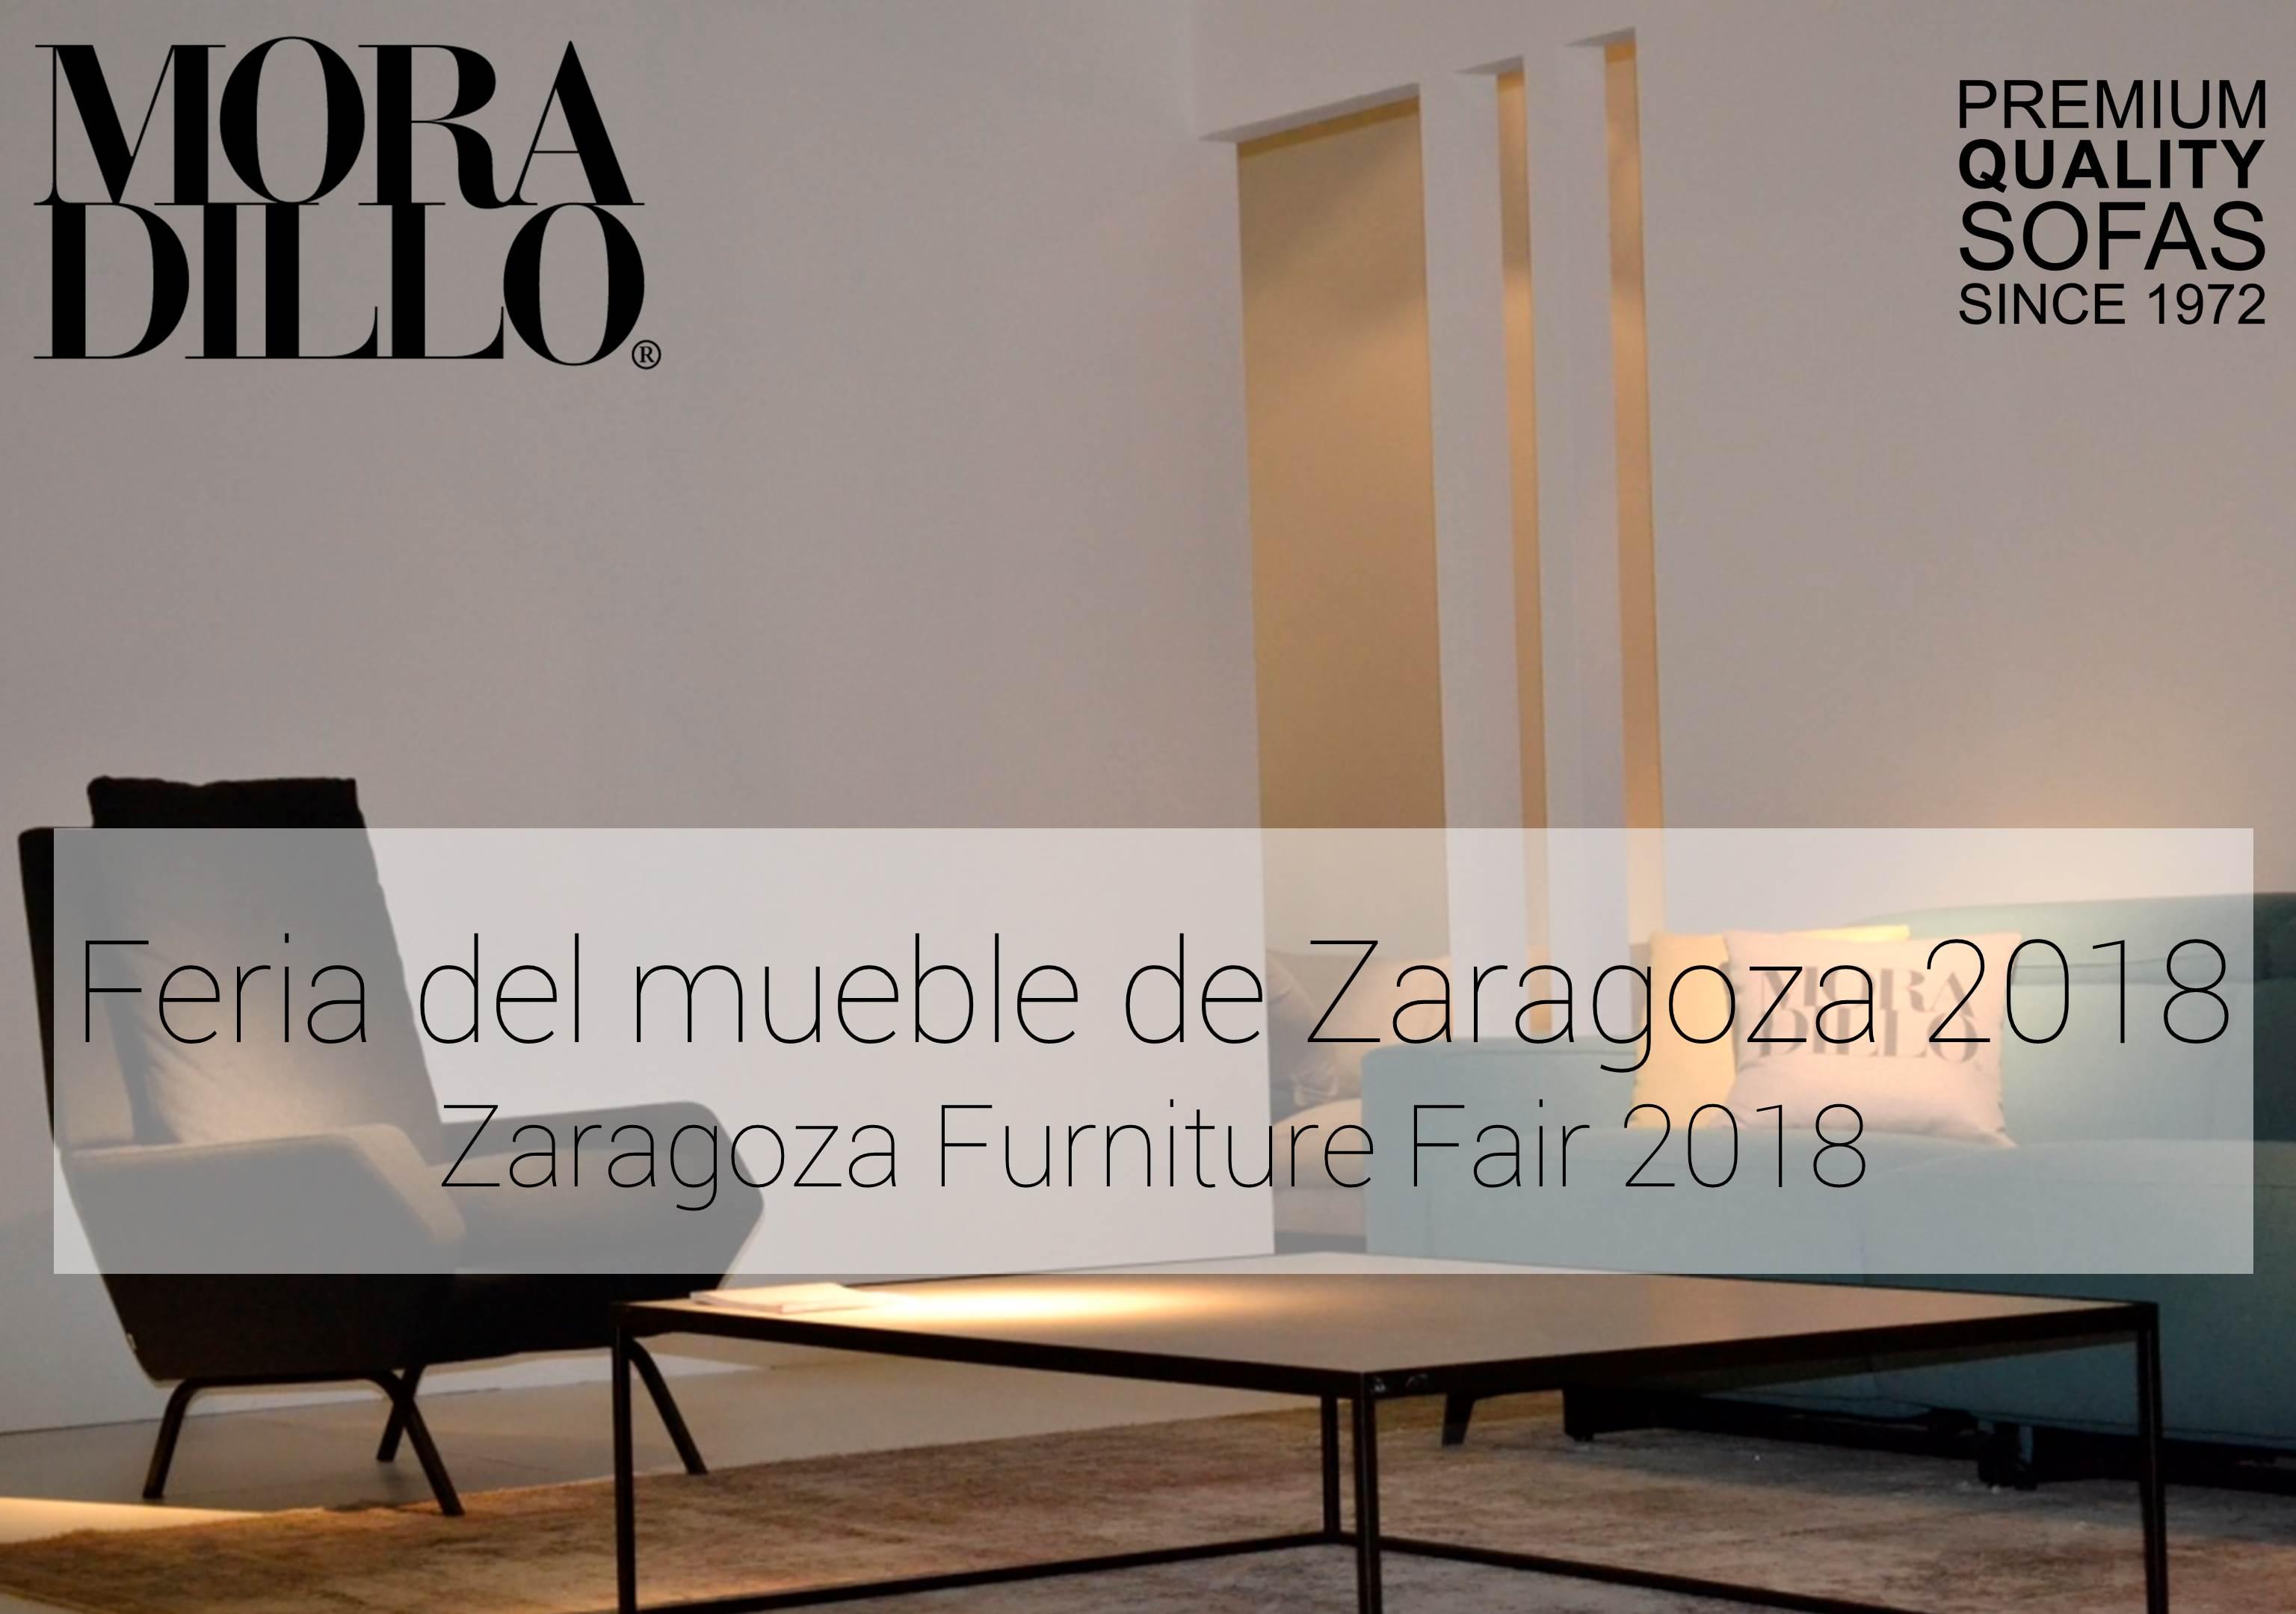 Muebles a medida en zaragoza affordable bao roble with muebles a medida en zaragoza good son - Muebles a medida en zaragoza ...